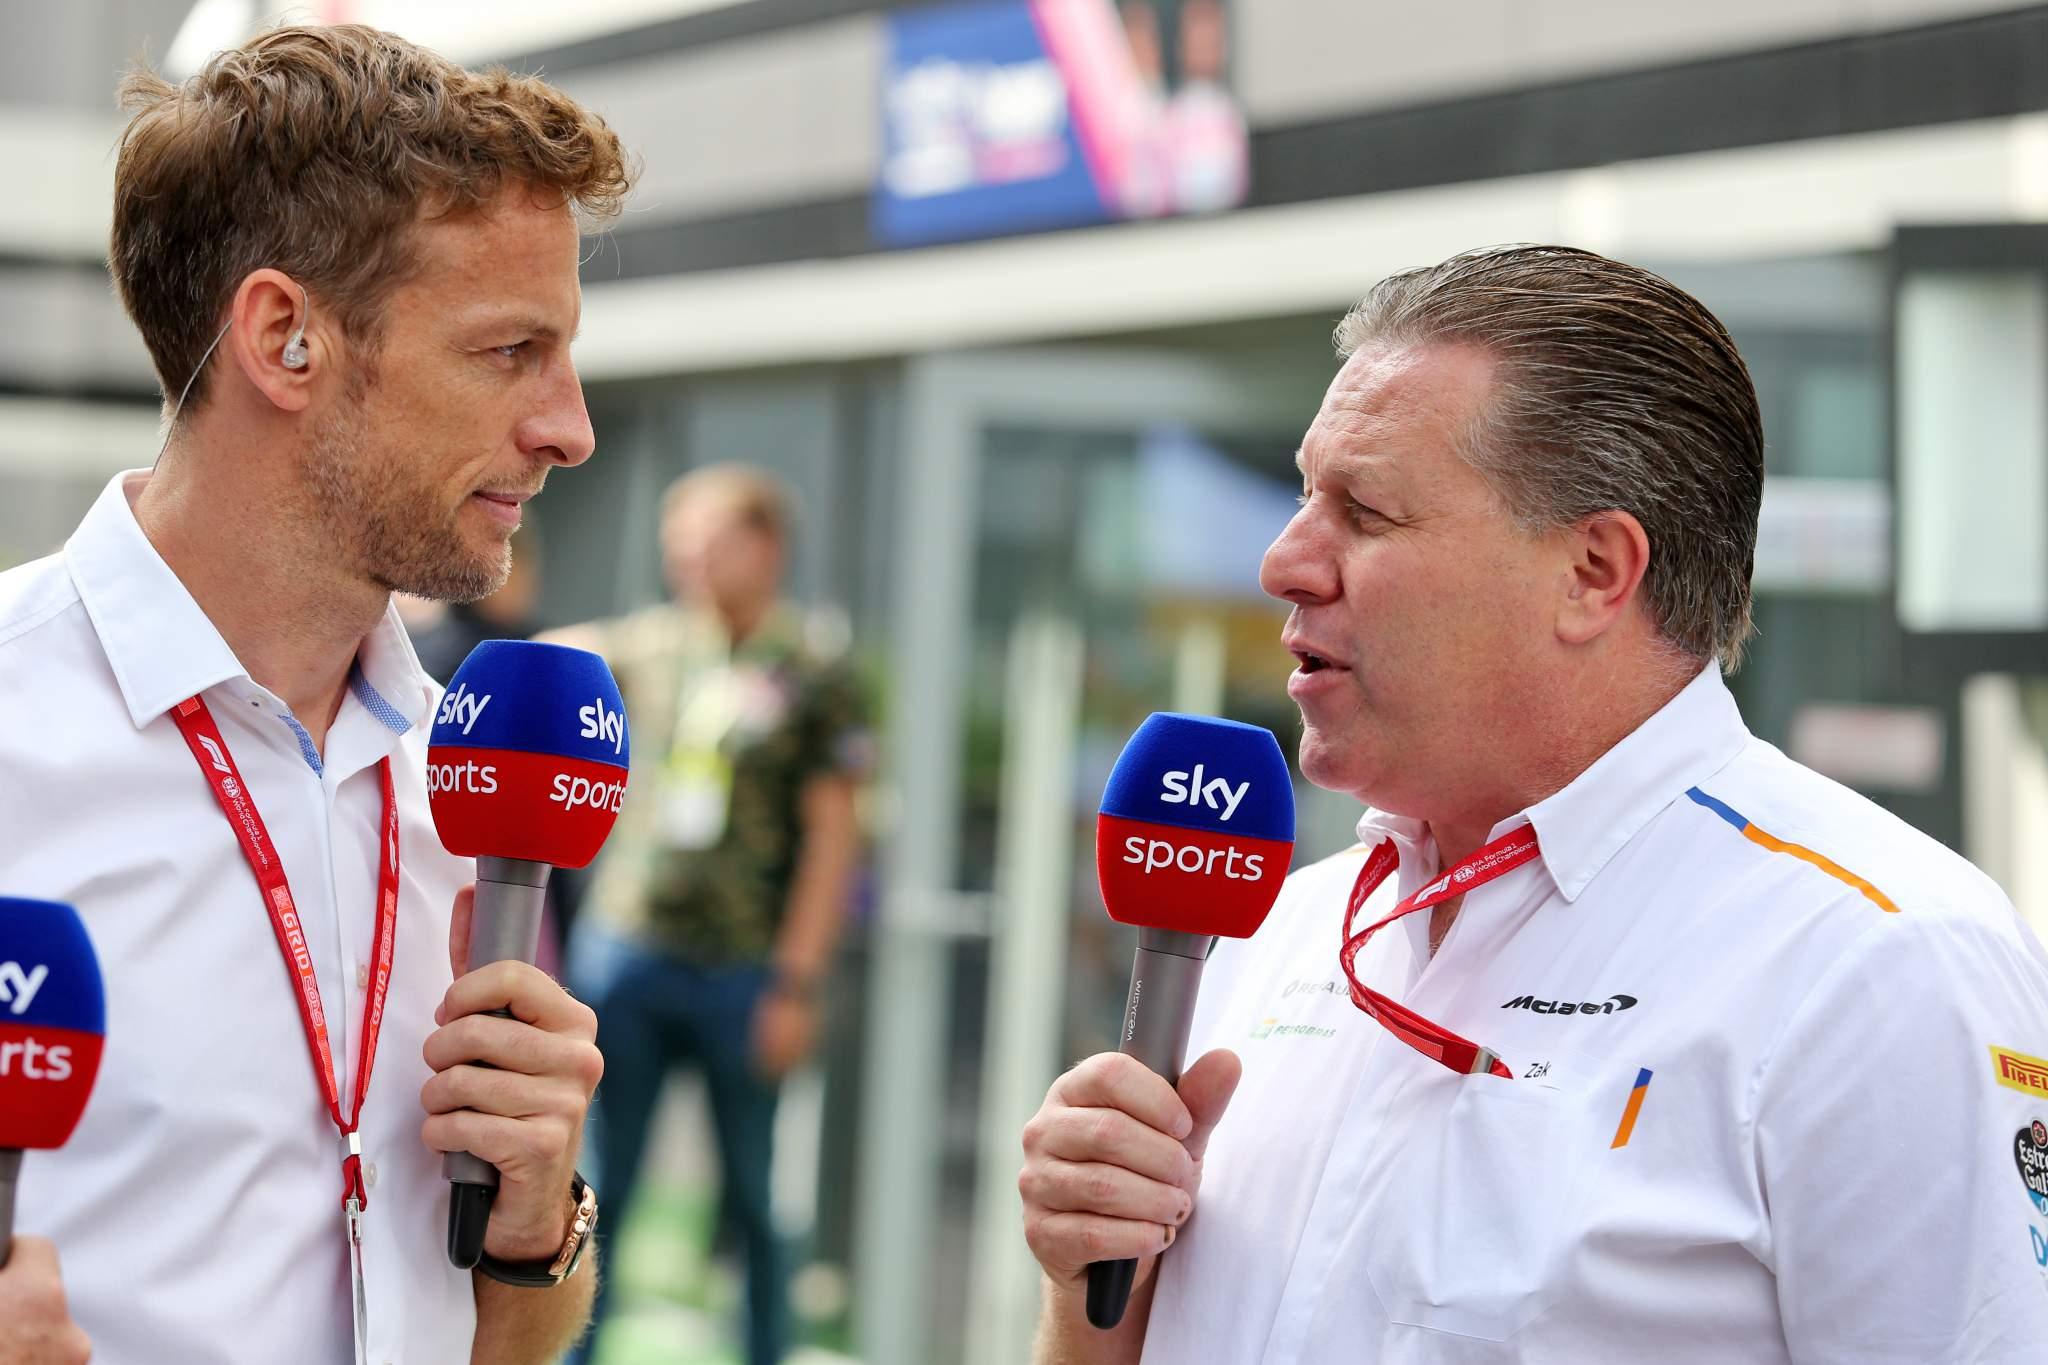 Jenson Button Zak Brown IndyCar McLaren 2020